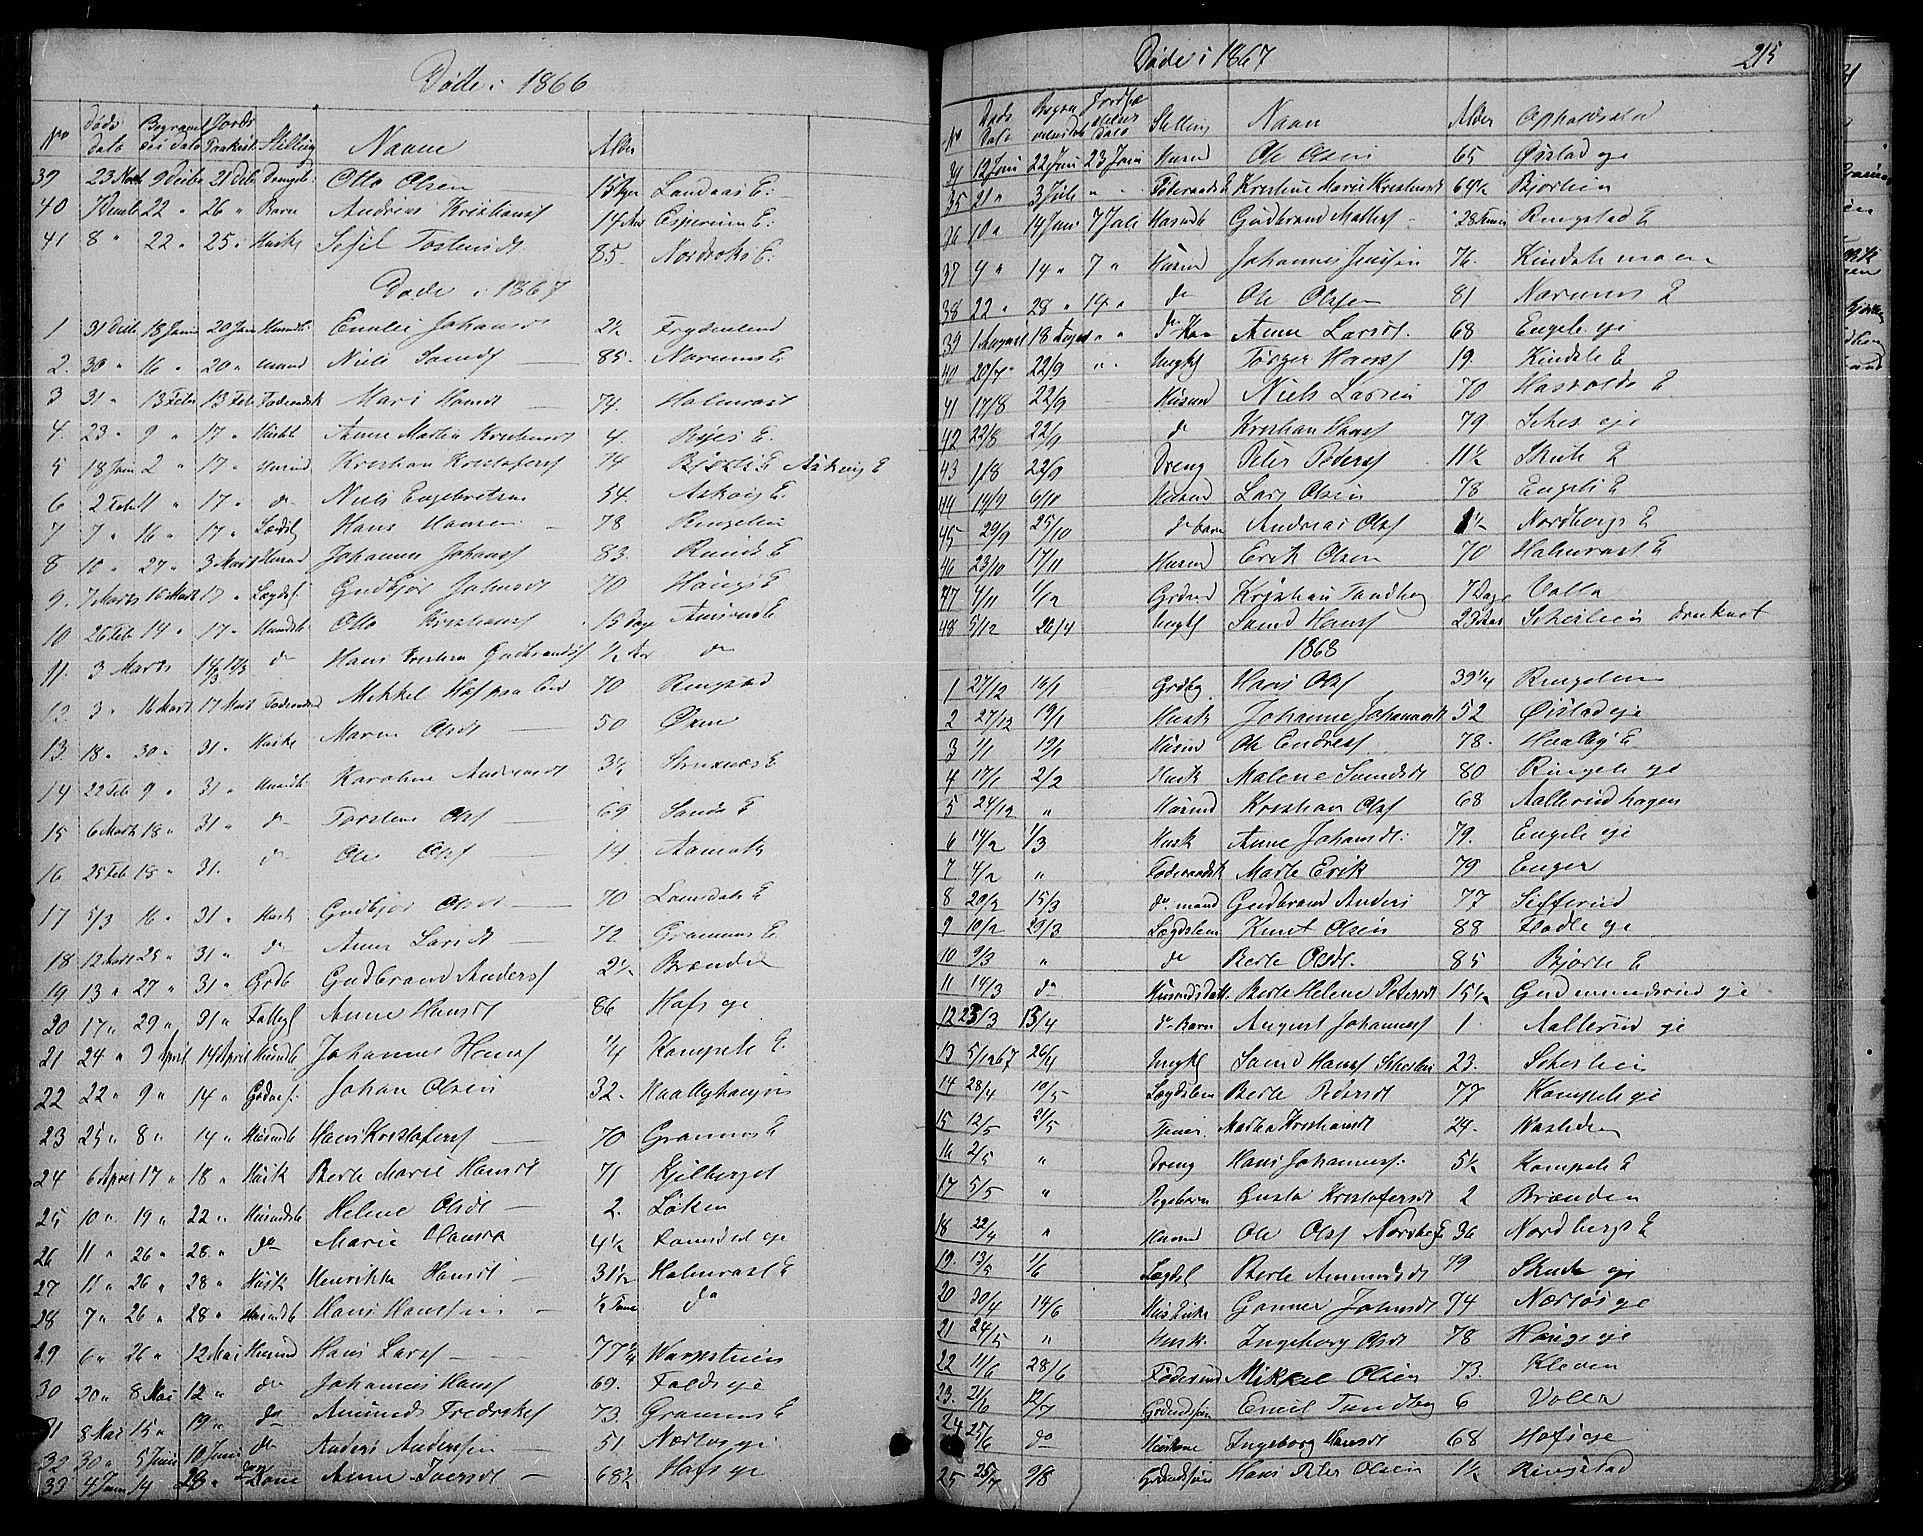 SAH, Søndre Land prestekontor, L/L0001: Klokkerbok nr. 1, 1849-1883, s. 215